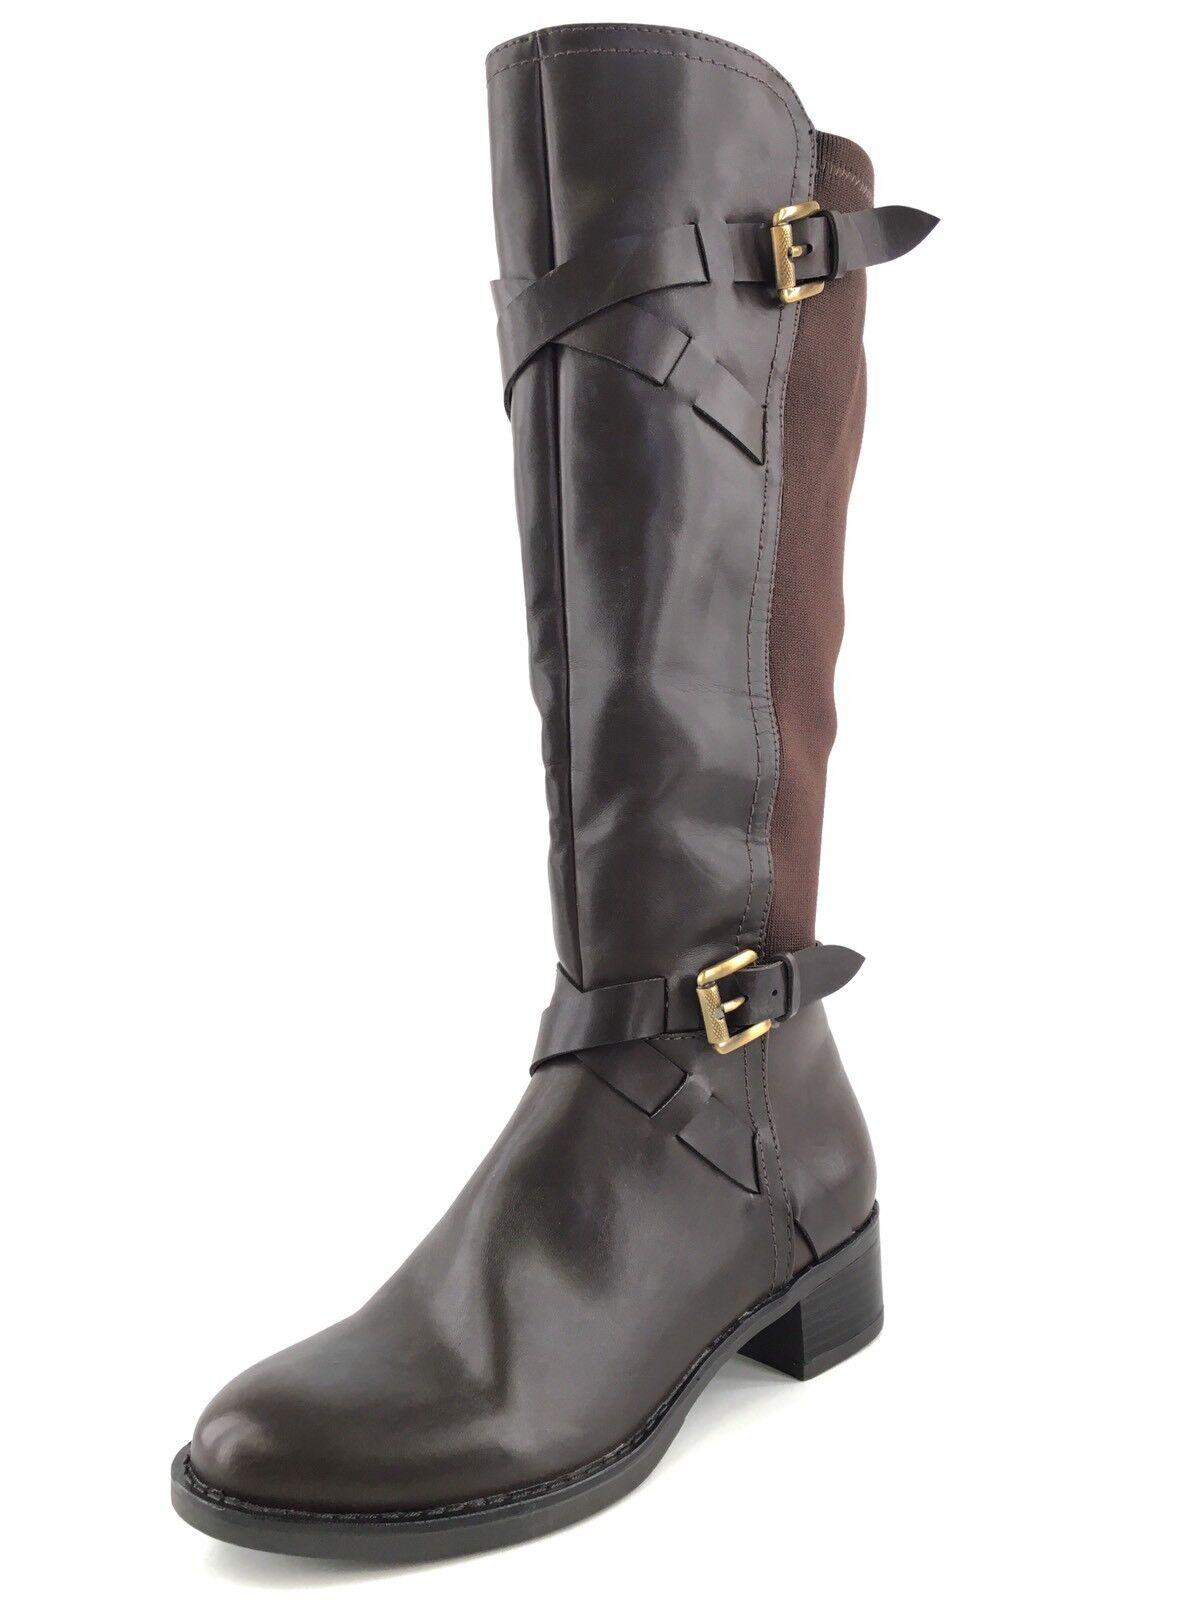 Franco Sarto donna Chrome Marroneee Knee High Leather Knit stivali Dimensione 5.5 M